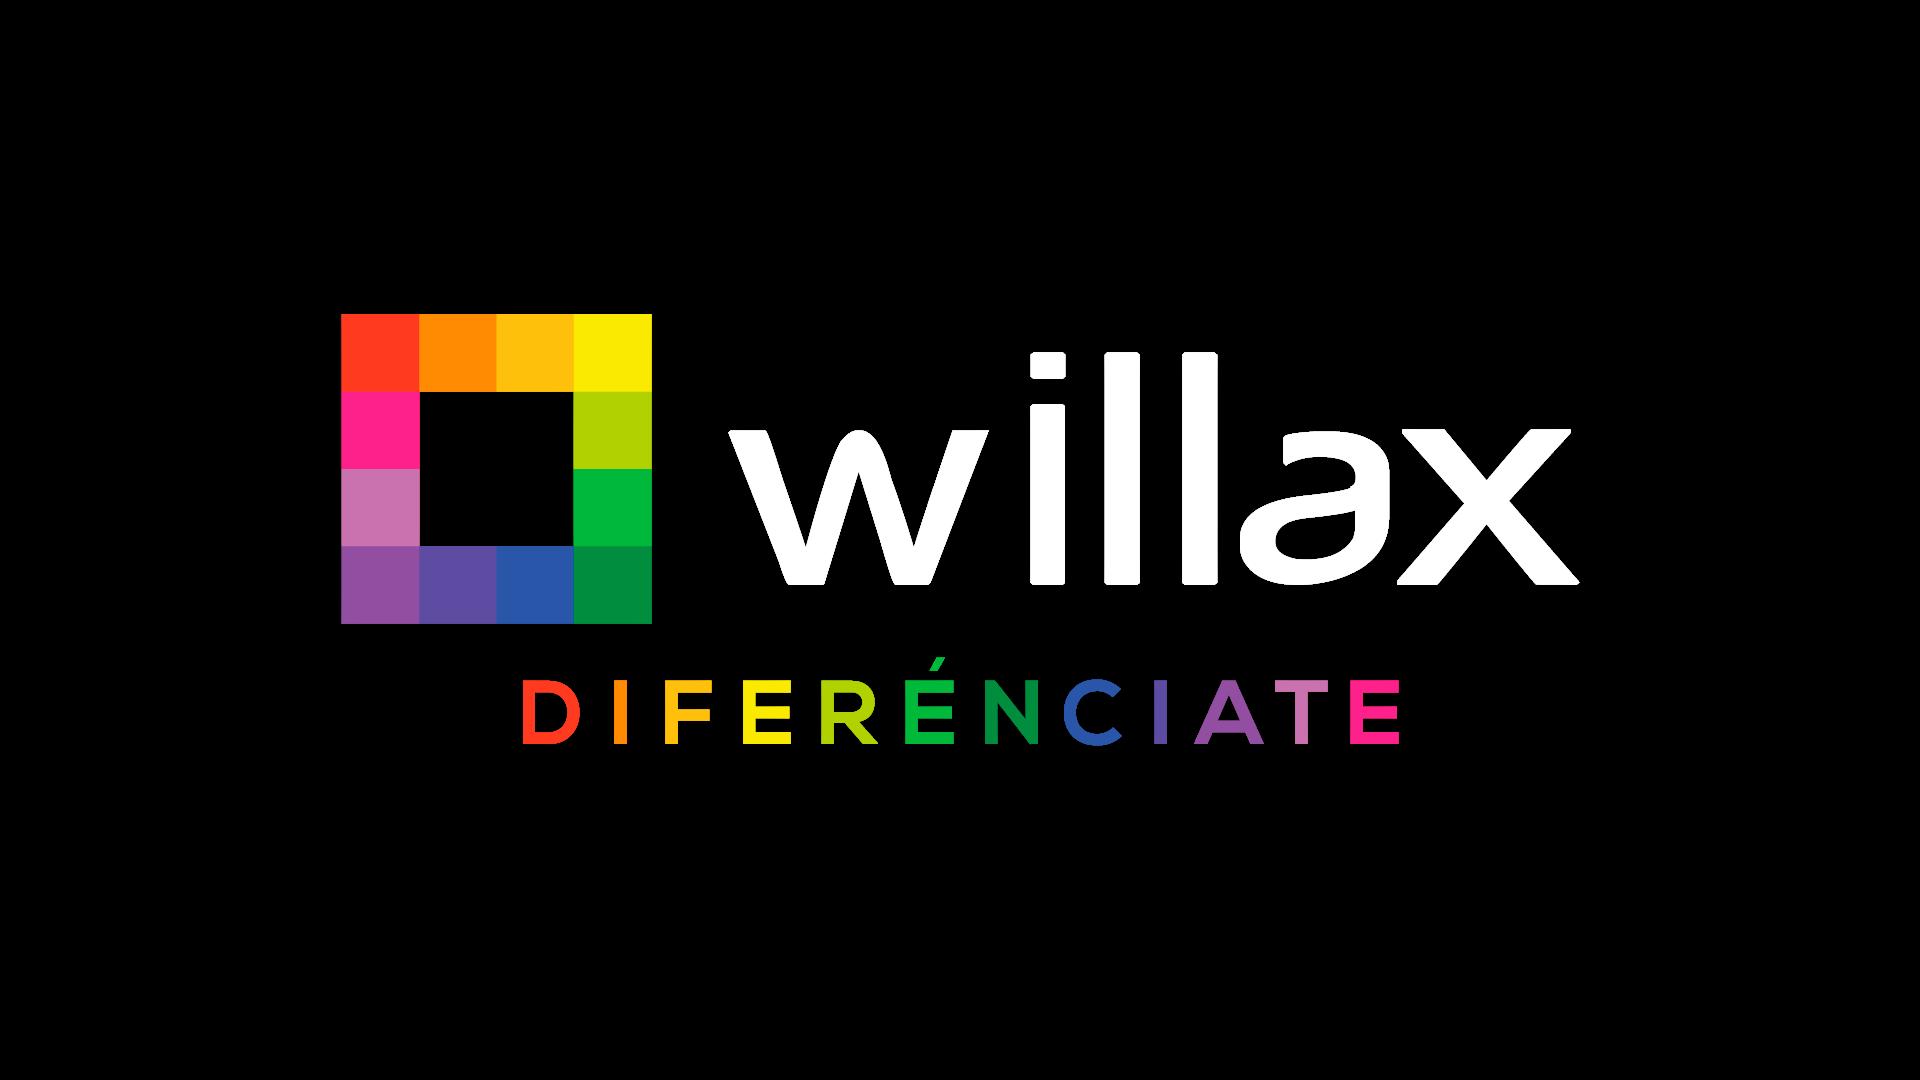 WILLAX